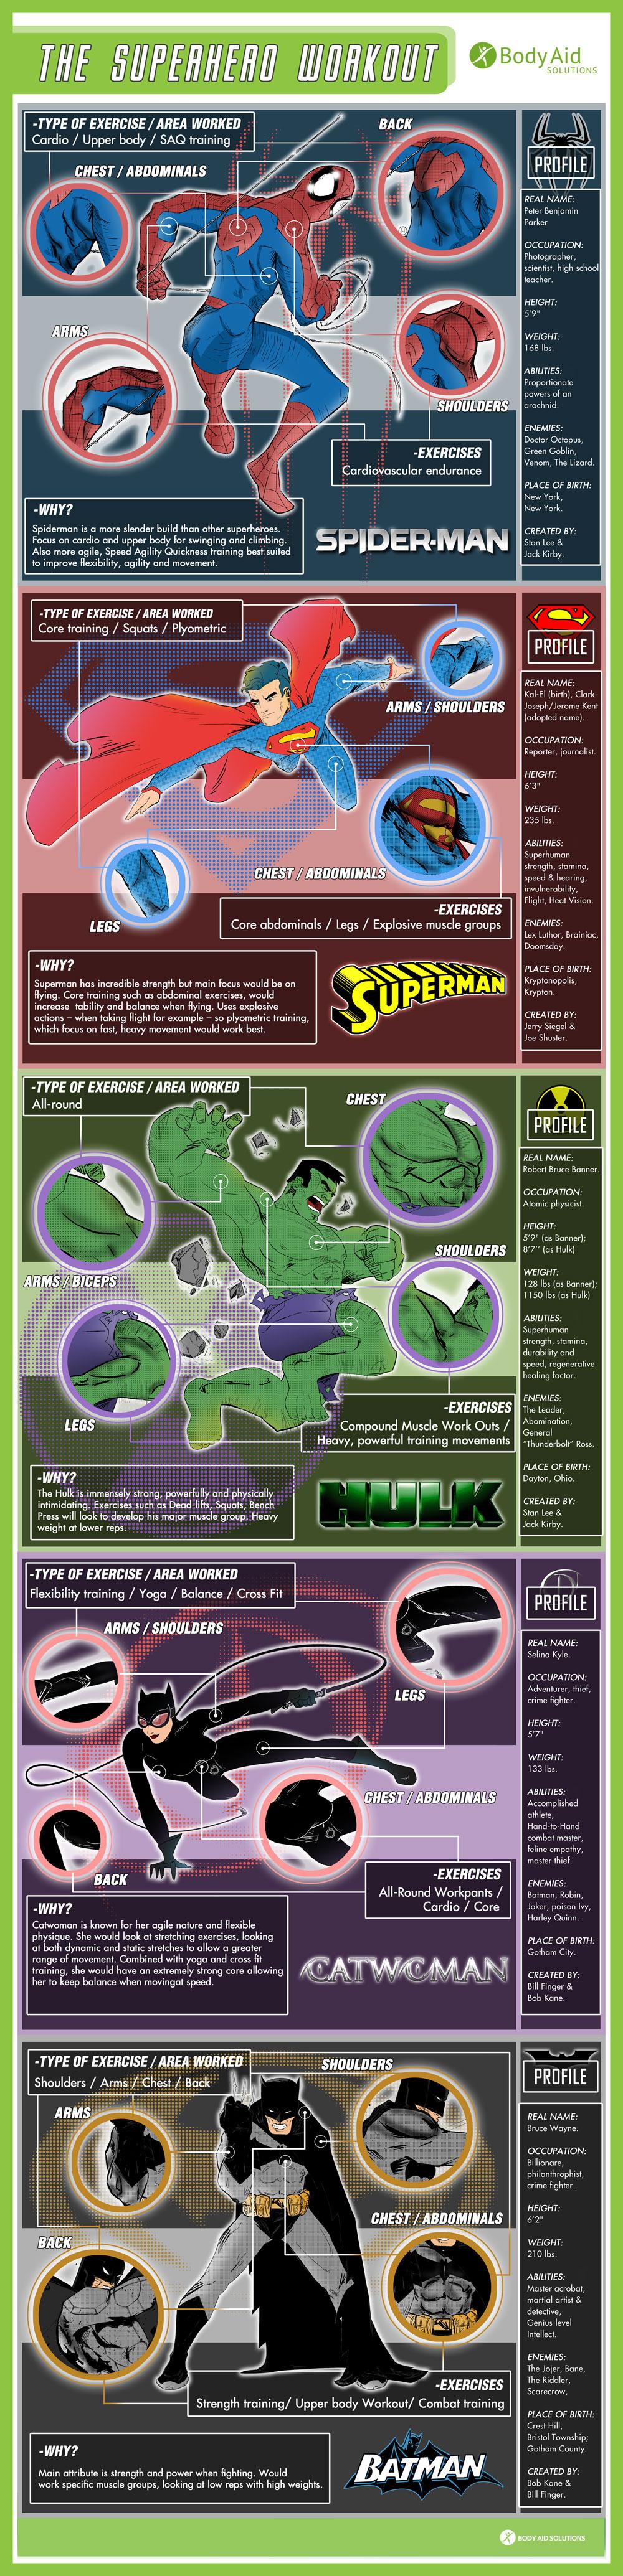 superhero-workout1